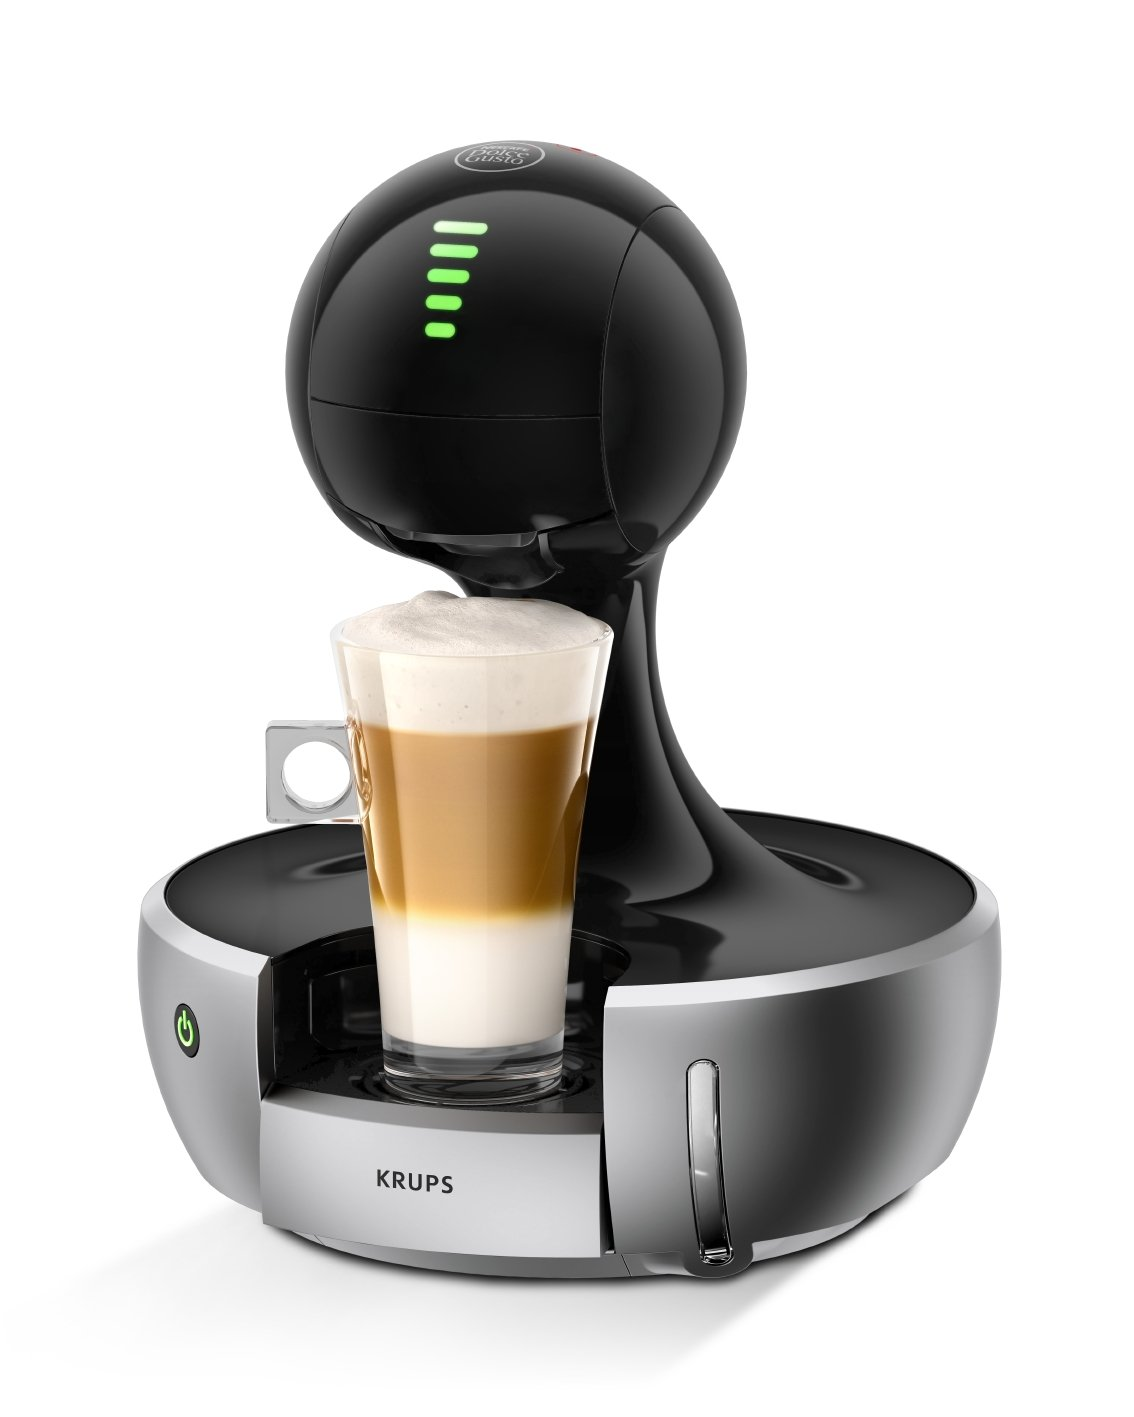 Krups kp350b31 Nescafe Dolce Gusto Drop Cafetera Eléctrica ...